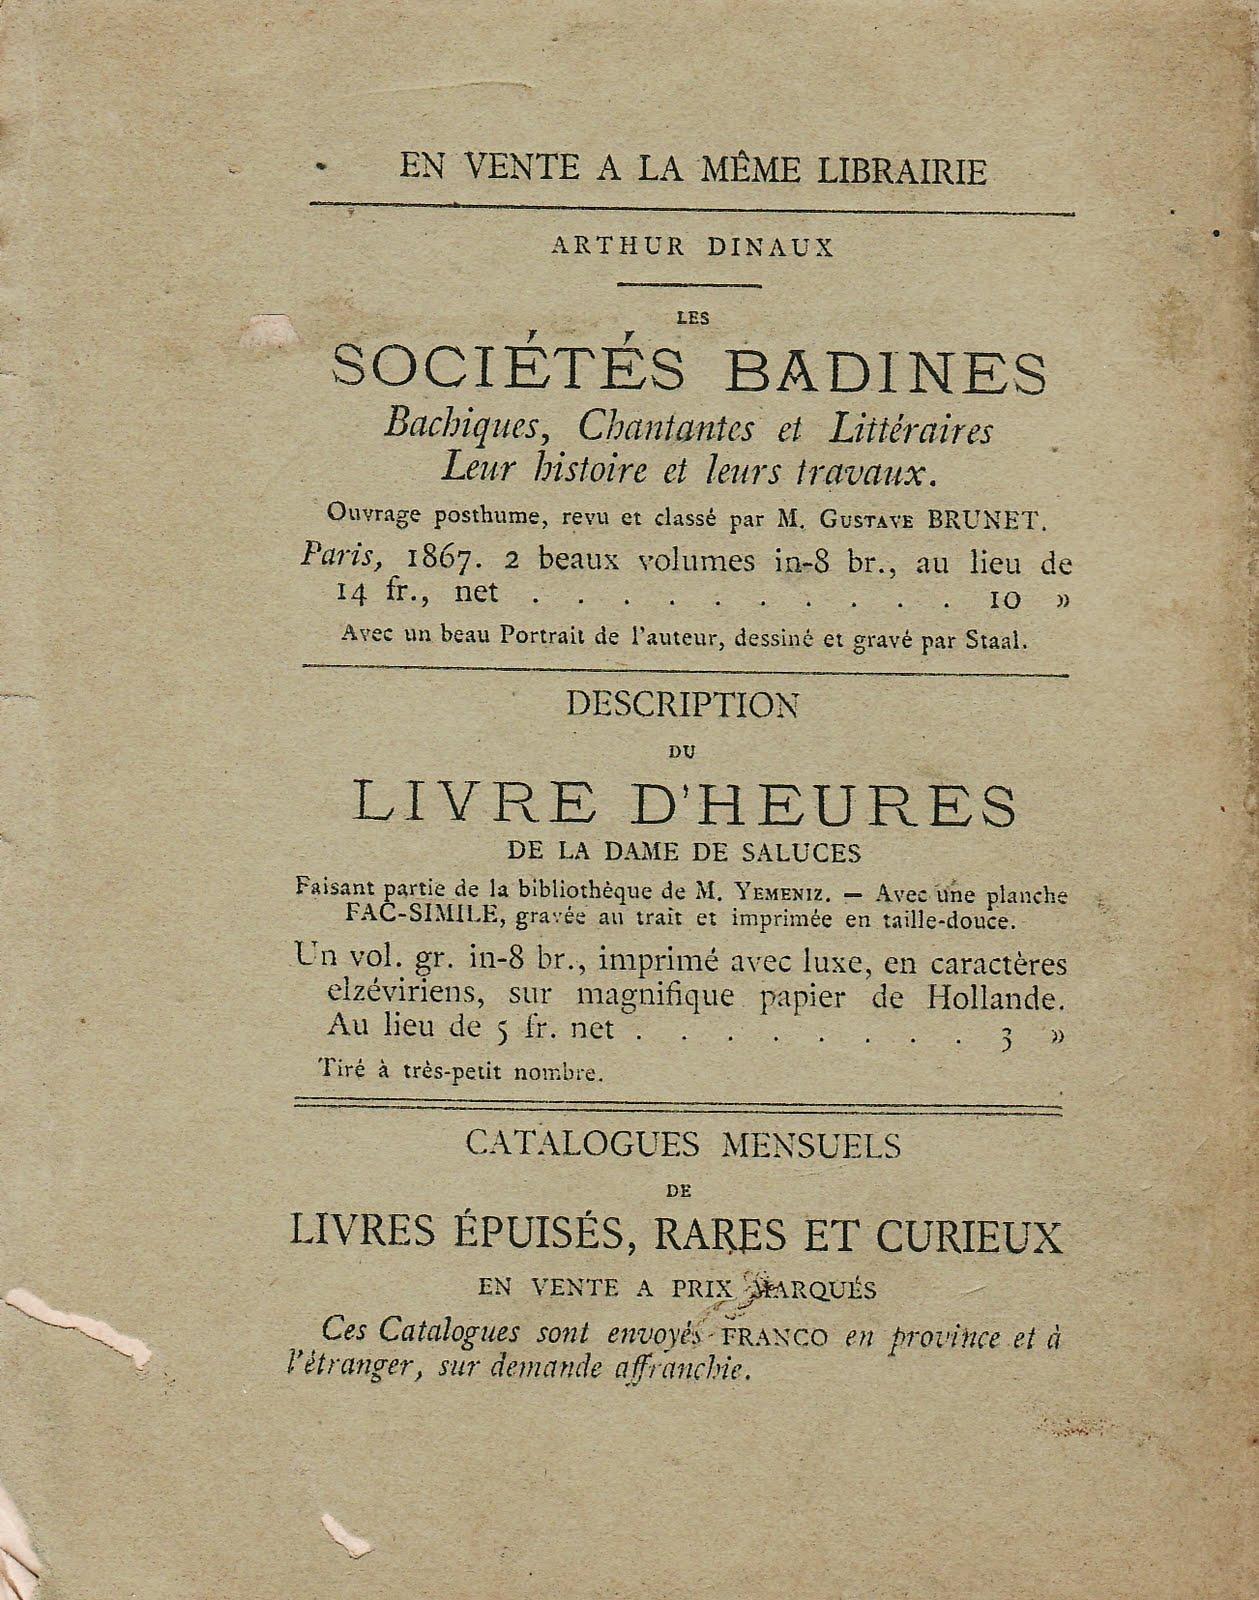 Dissertation Sur La Fable Corrig . Essay writing service | cheapessaywritingscom